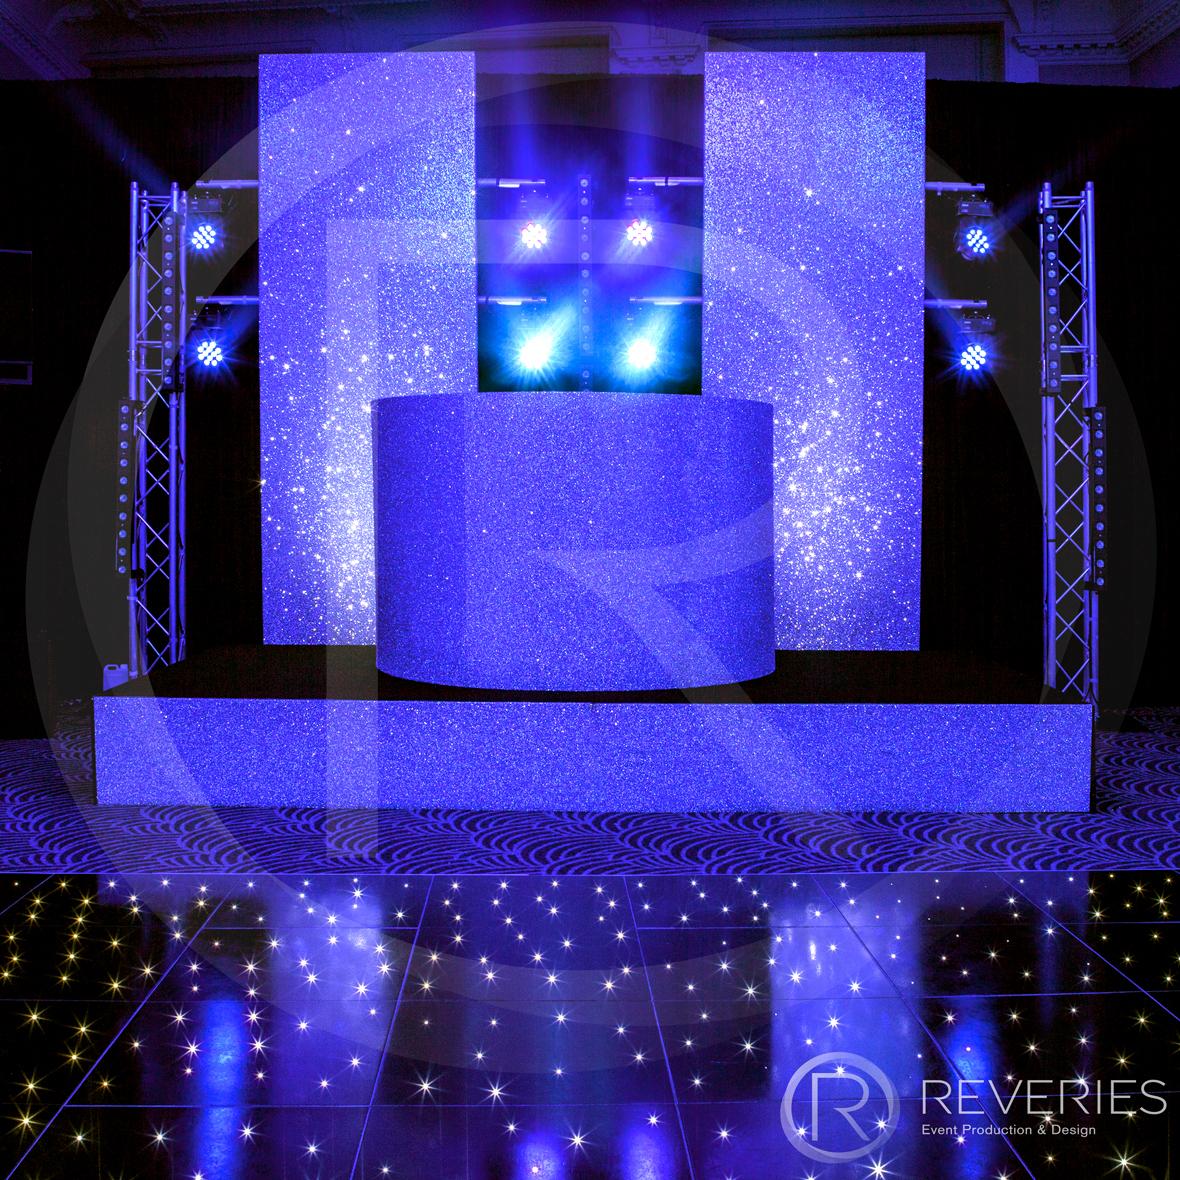 White Label - Bespoke glittered DJ booth and LED studded dancefloor